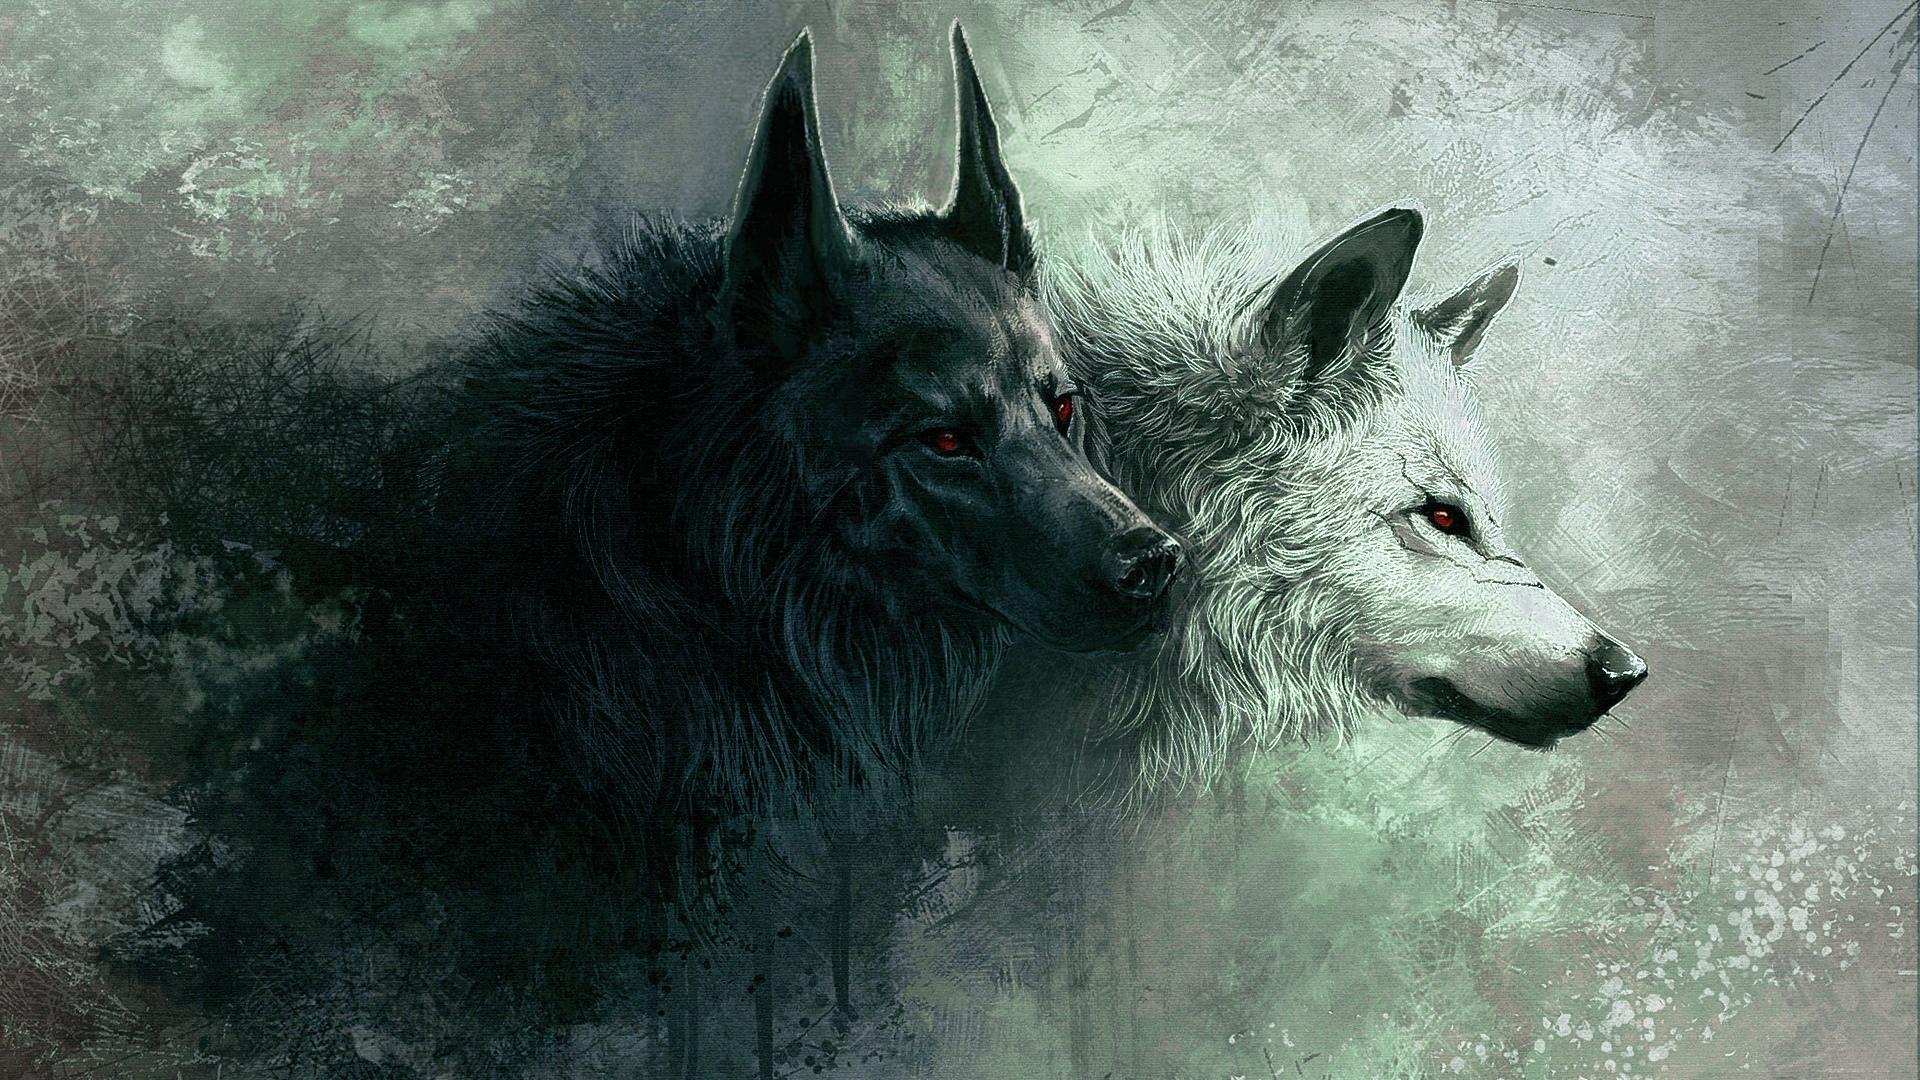 Loups_fond_ecran_dessin.jpg